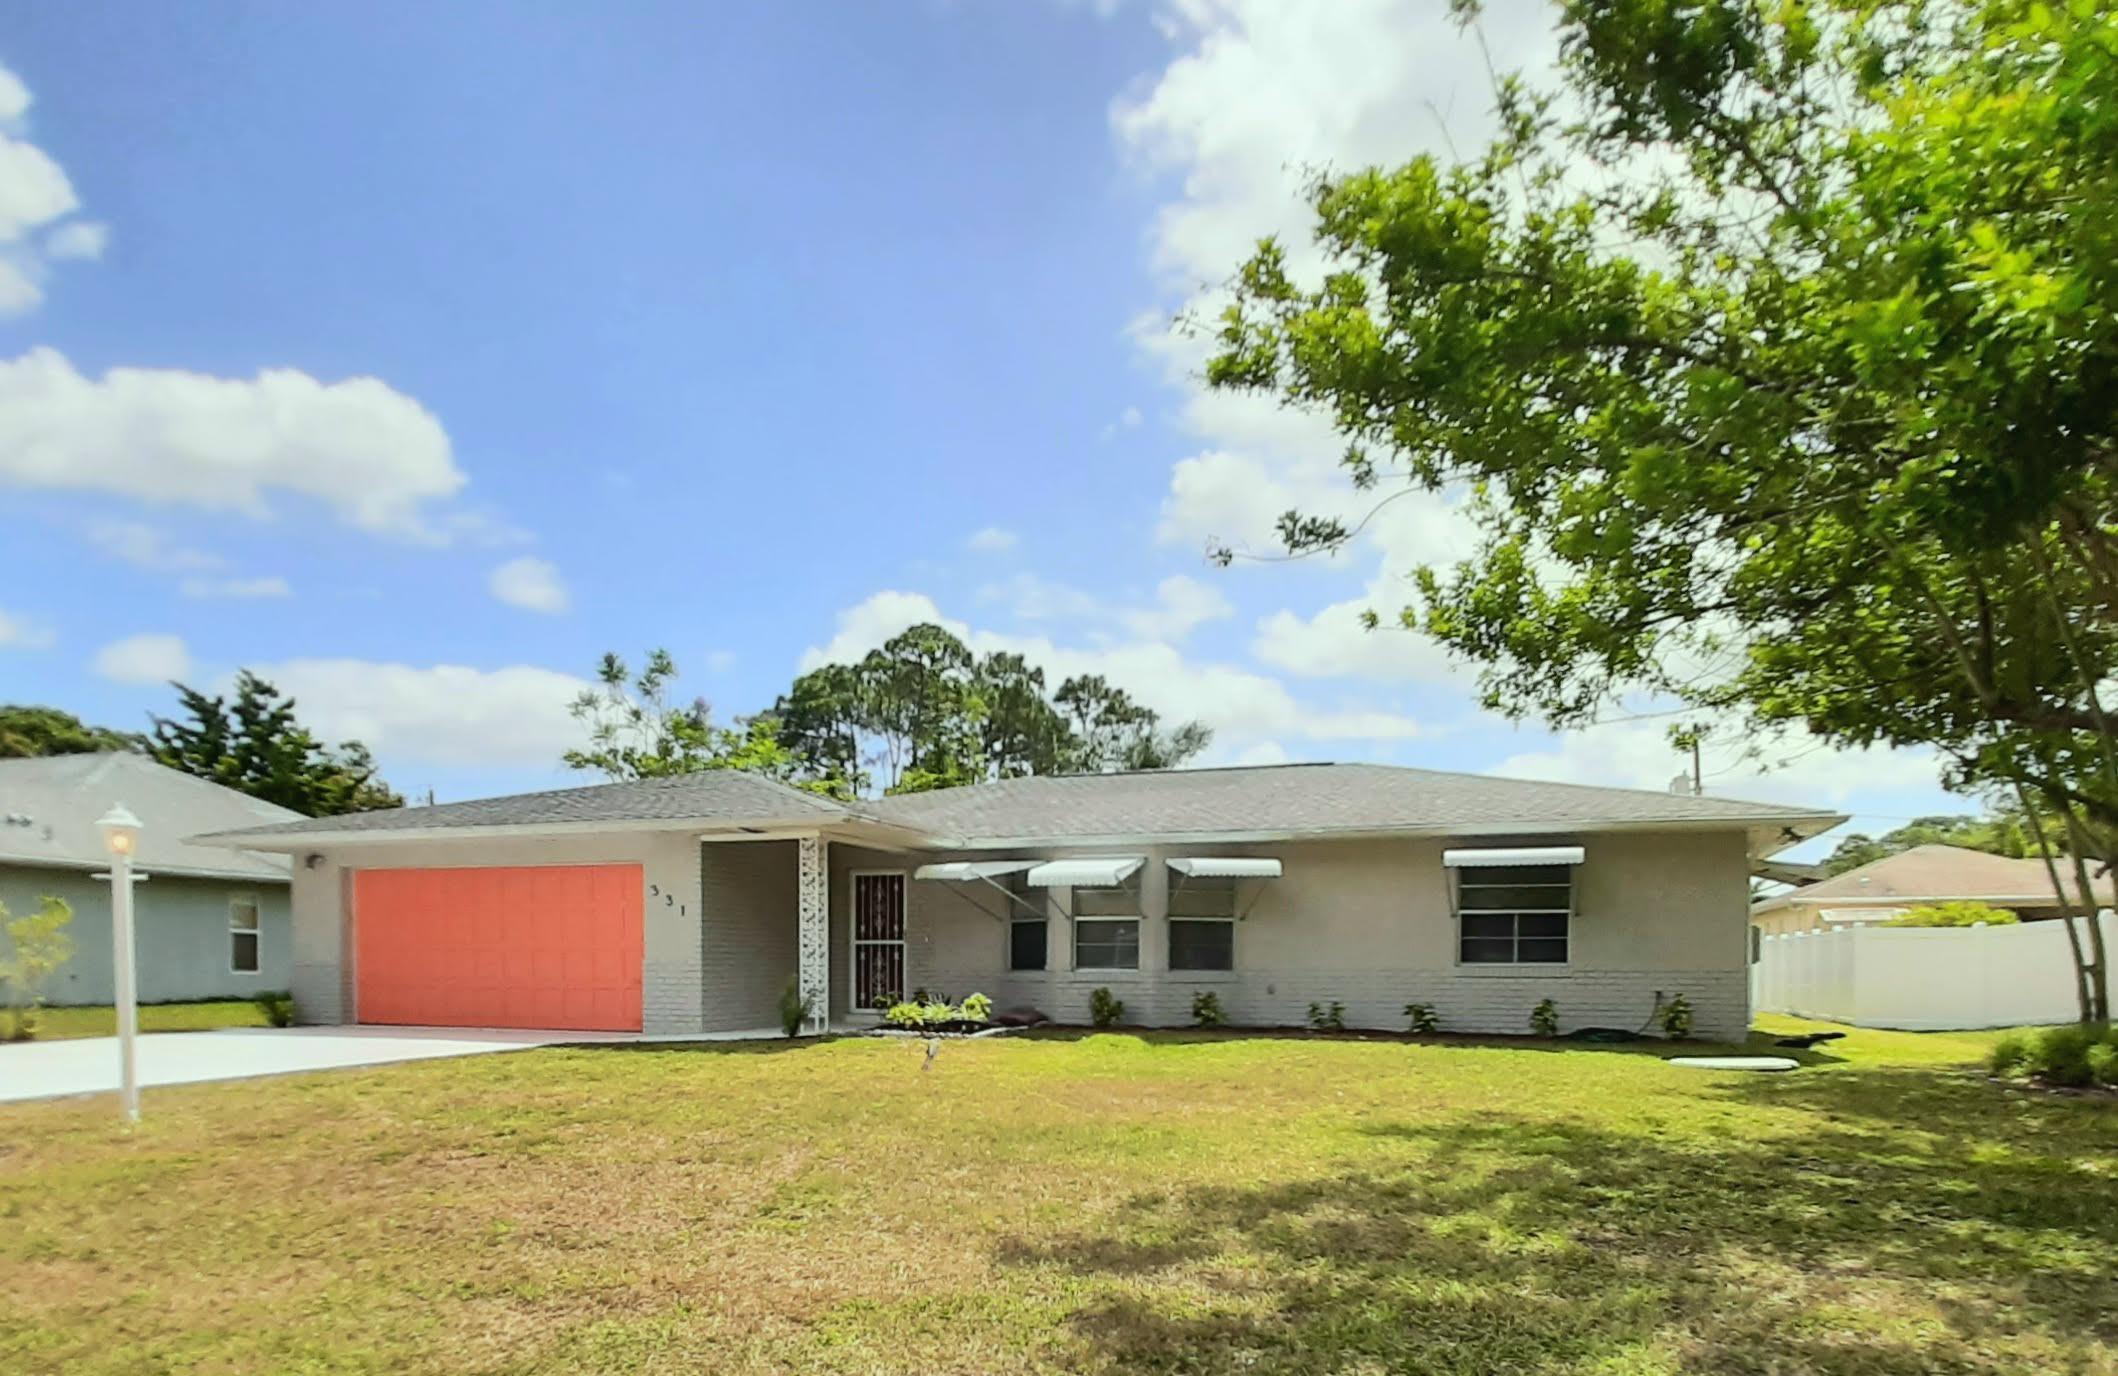 331 NW Camrose Street - 34983 - FL - Port Saint Lucie